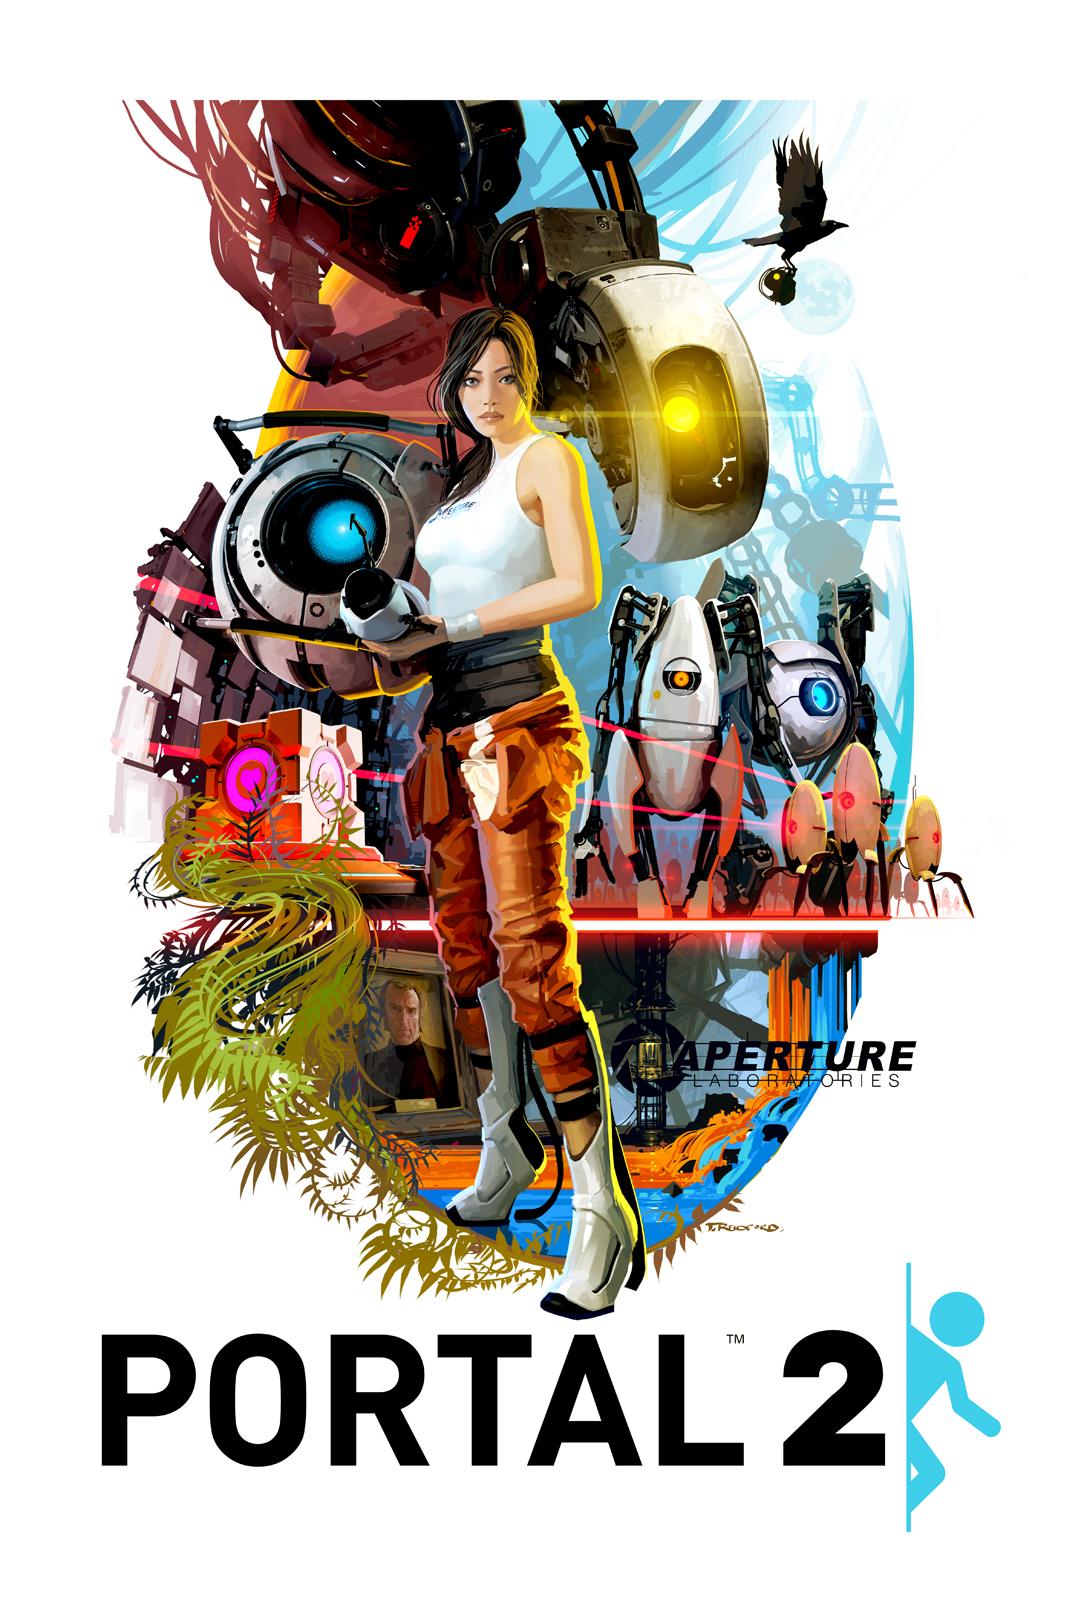 Lovely Tristan Reidford Art: Portal2 70s style movie poster! XO22